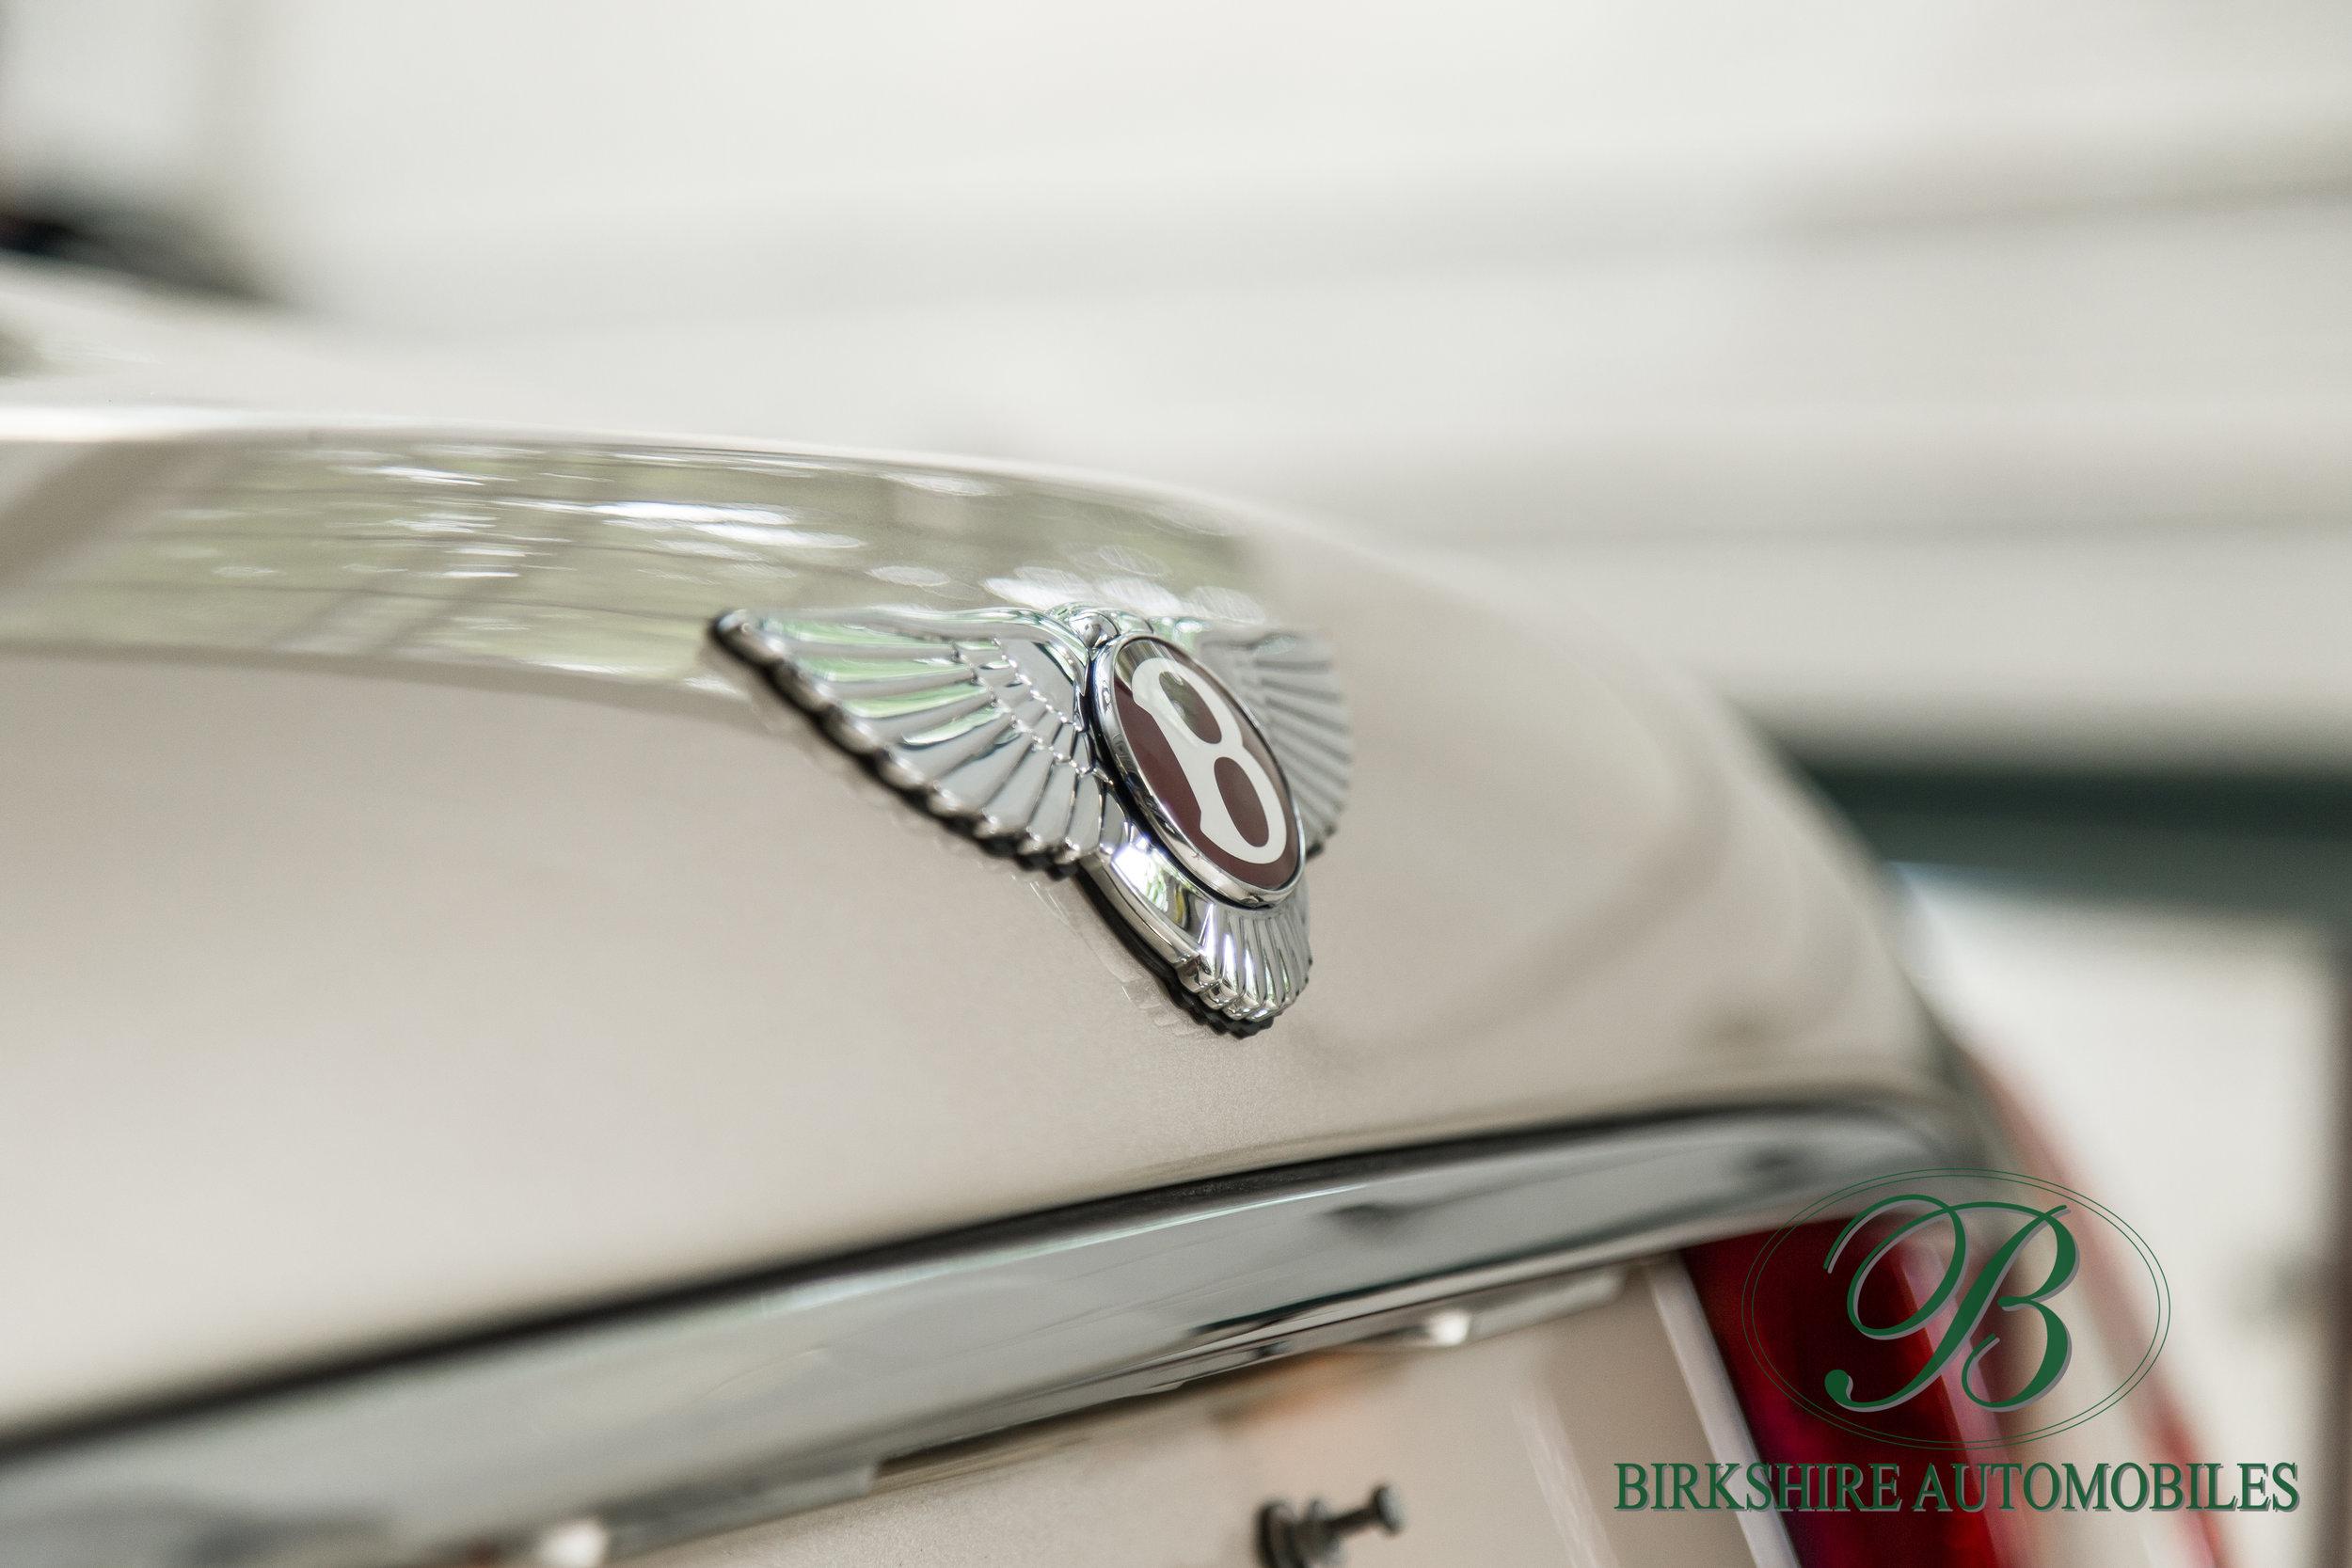 Birkshire Automobiles-346.jpg